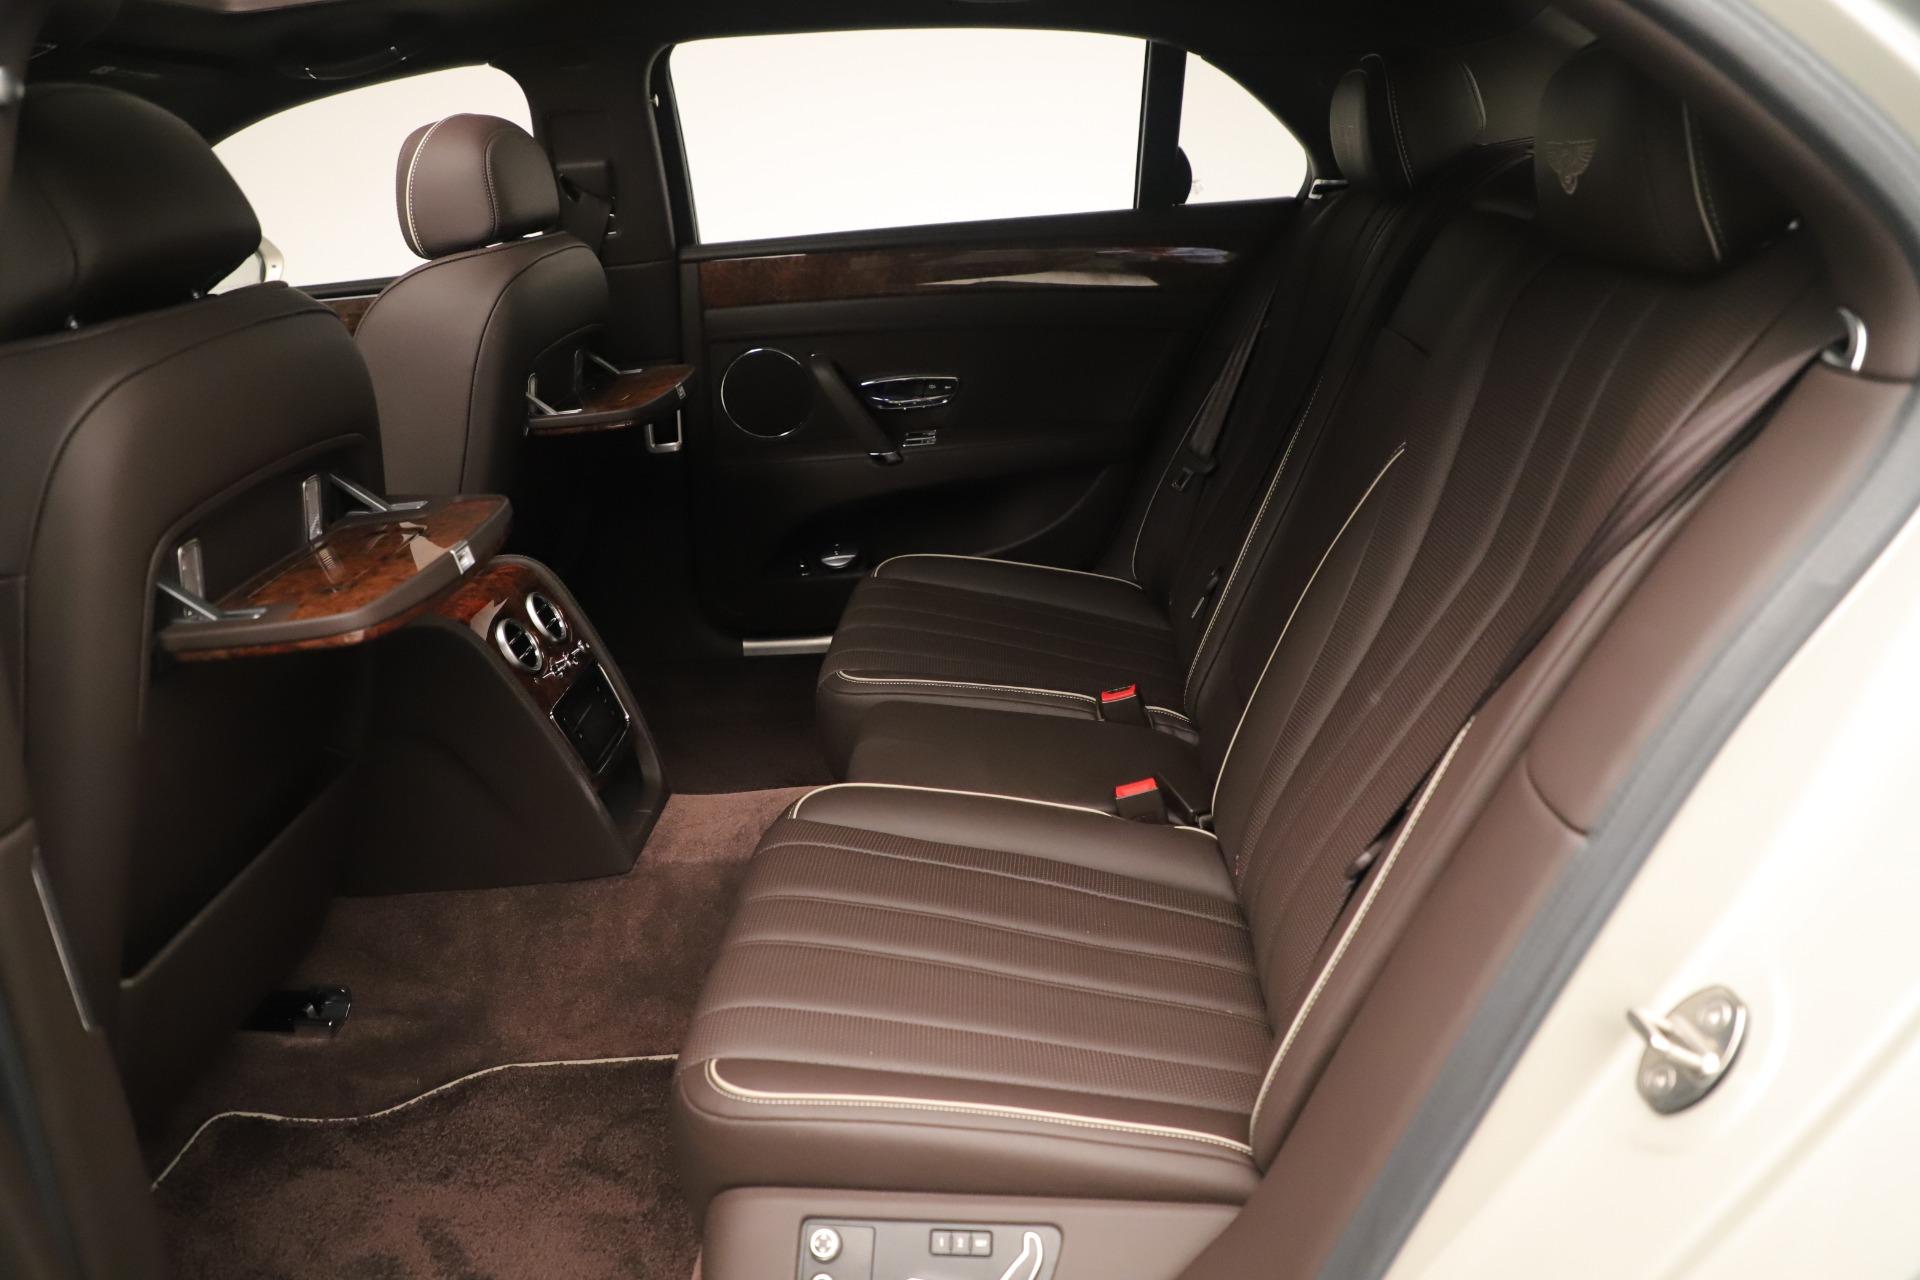 Used 2015 Bentley Flying Spur V8 For Sale In Westport, CT 3444_p21